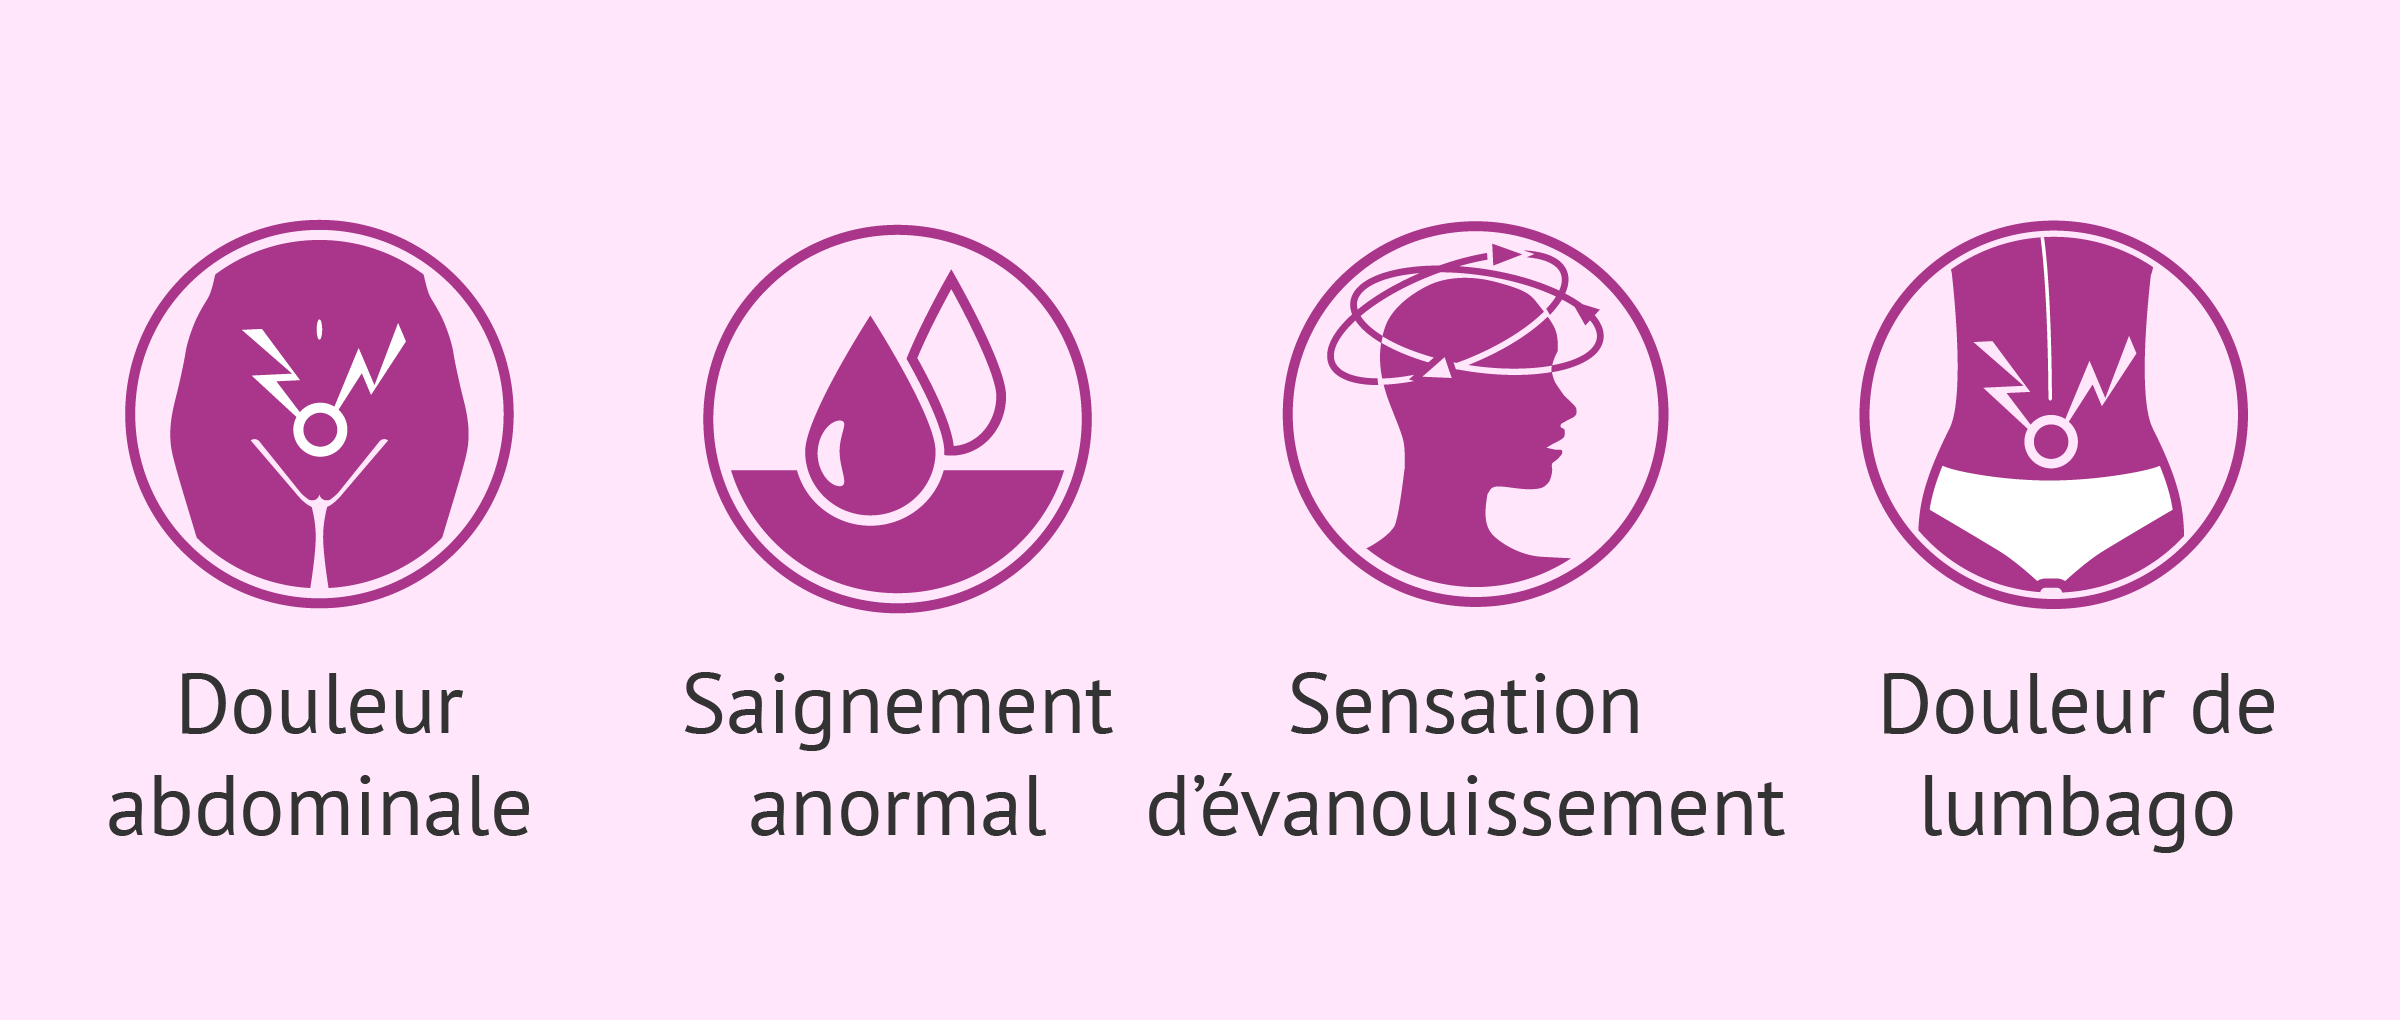 Symptômes de la grossesse extra-utérine